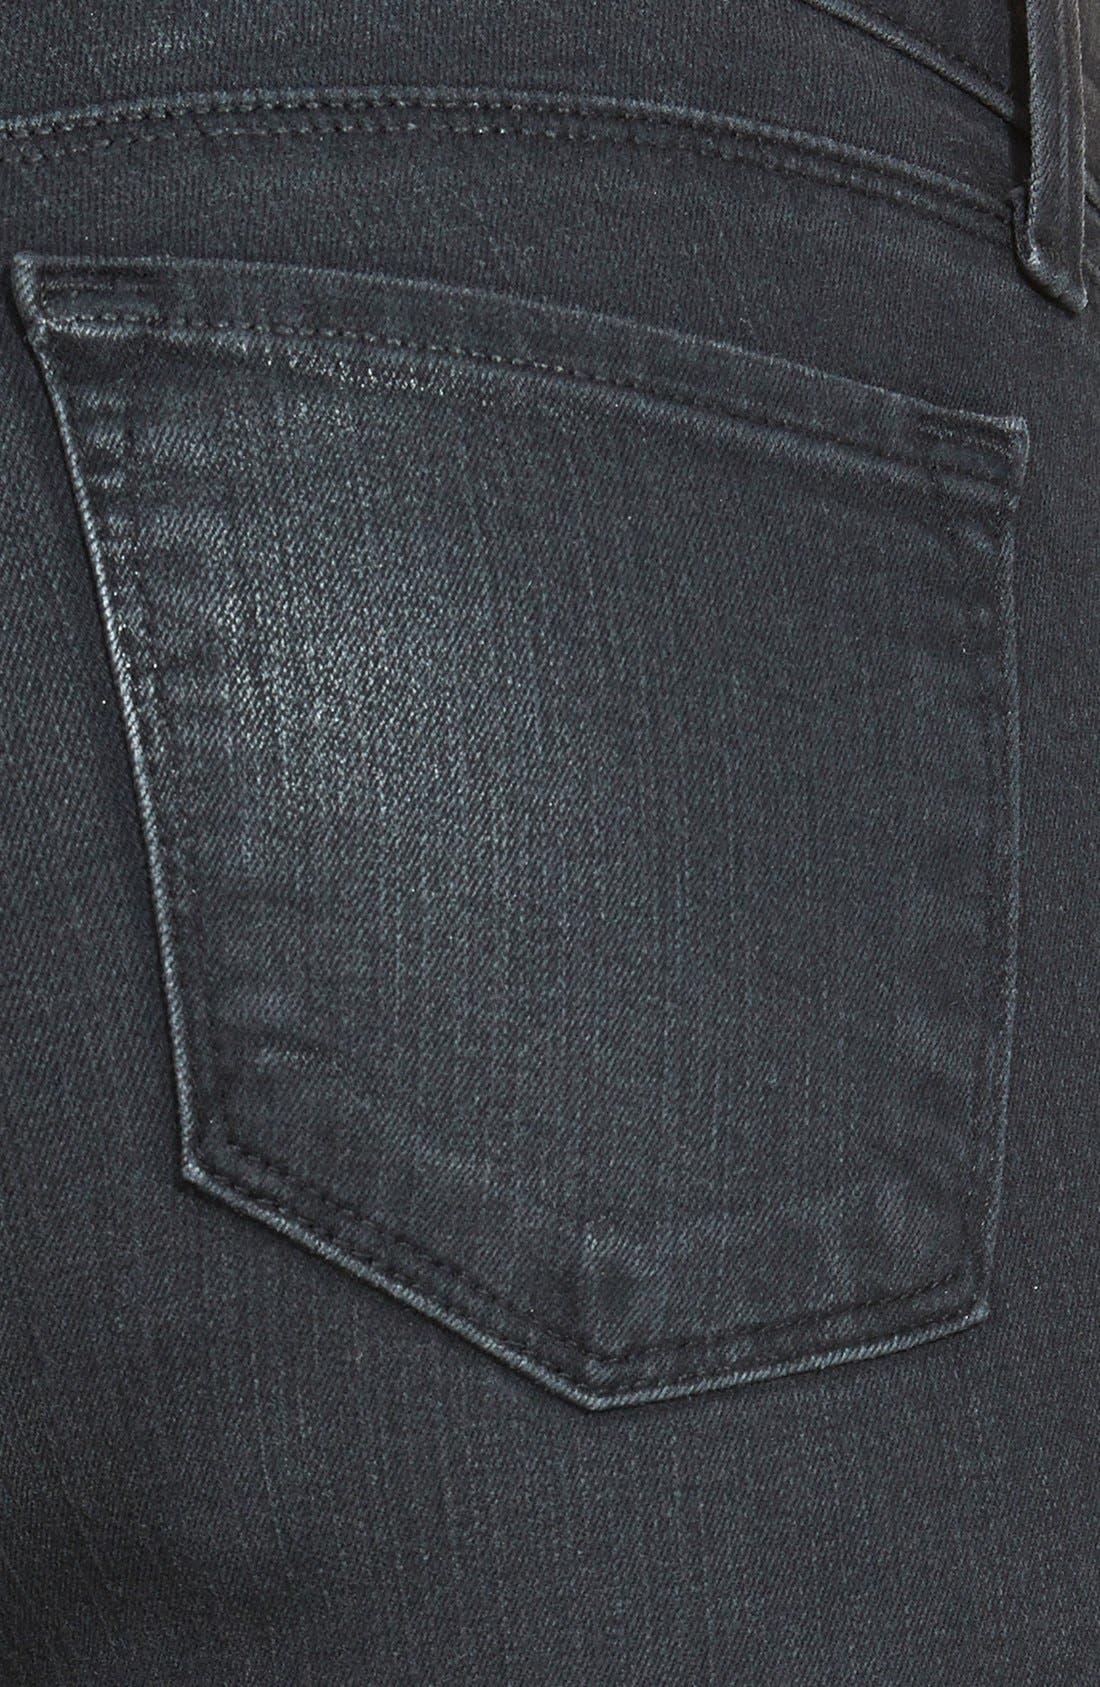 '620' Mid Rise Skinny Jeans,                             Alternate thumbnail 15, color,